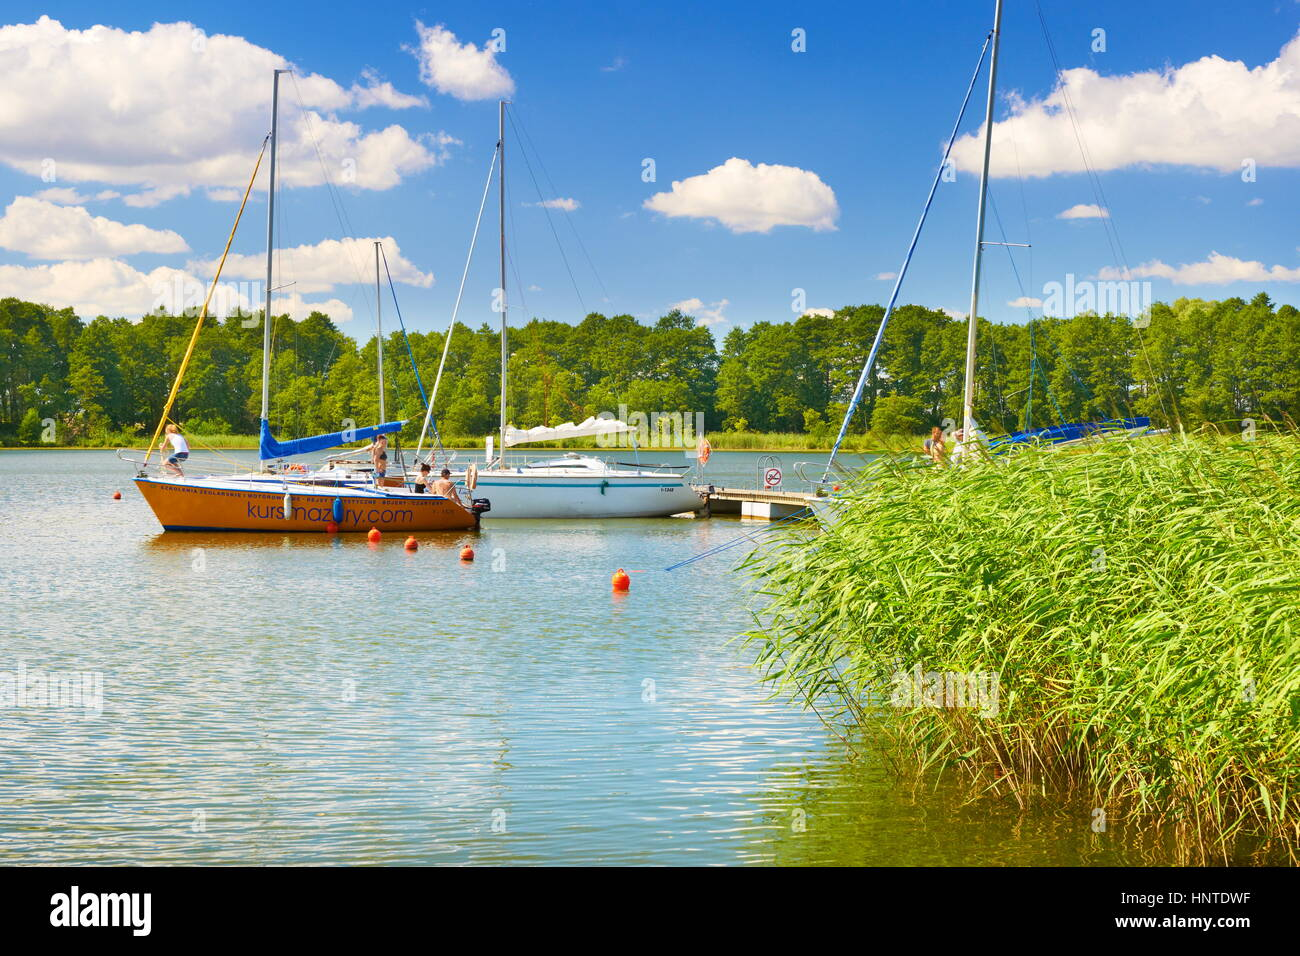 Sailboats at Sztynort Lake, Masuria region, Poland, Europe - Stock Image